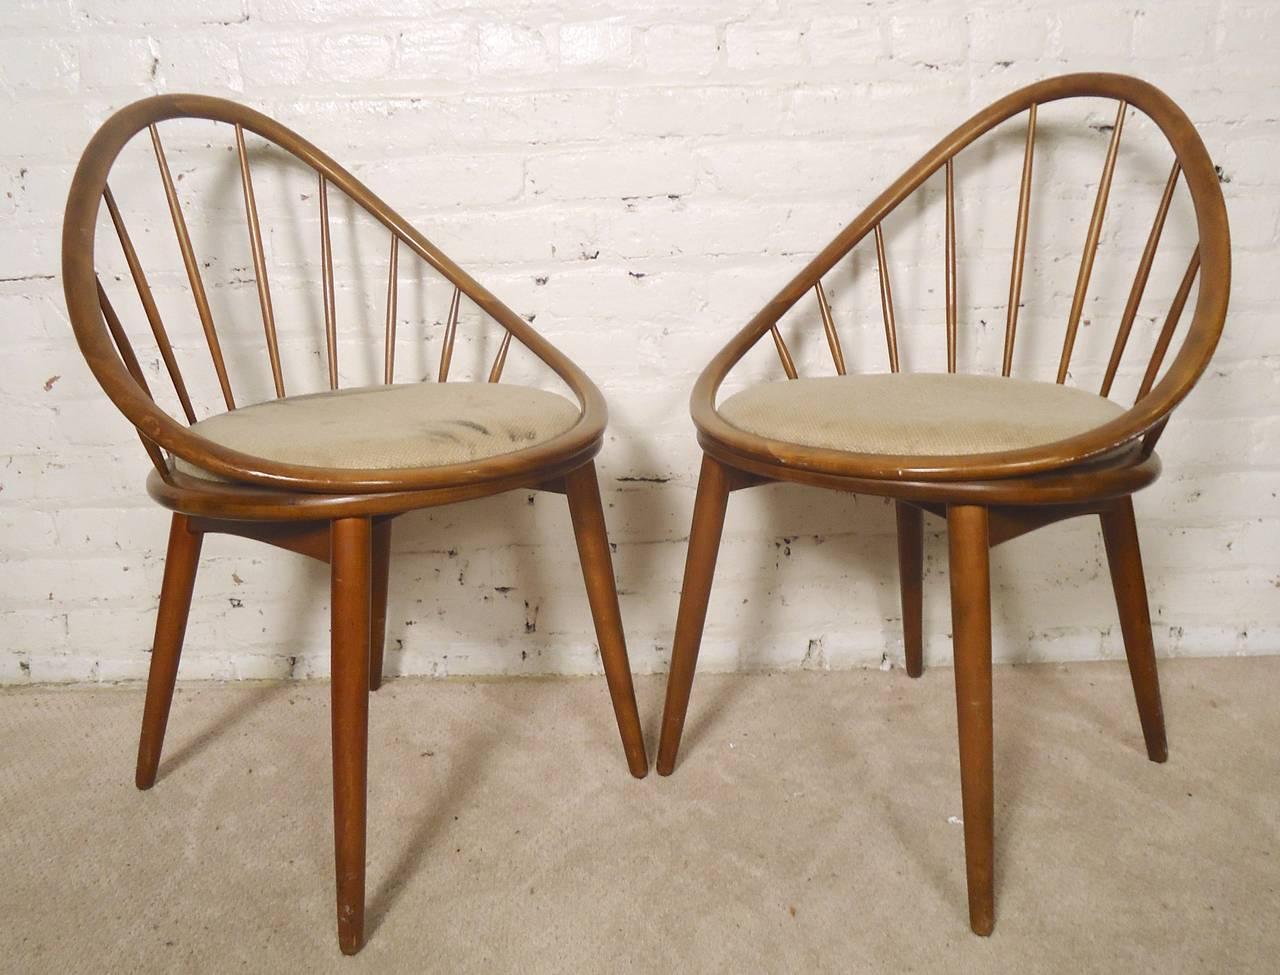 Kofod Larsen Style Hoop Chairs 2